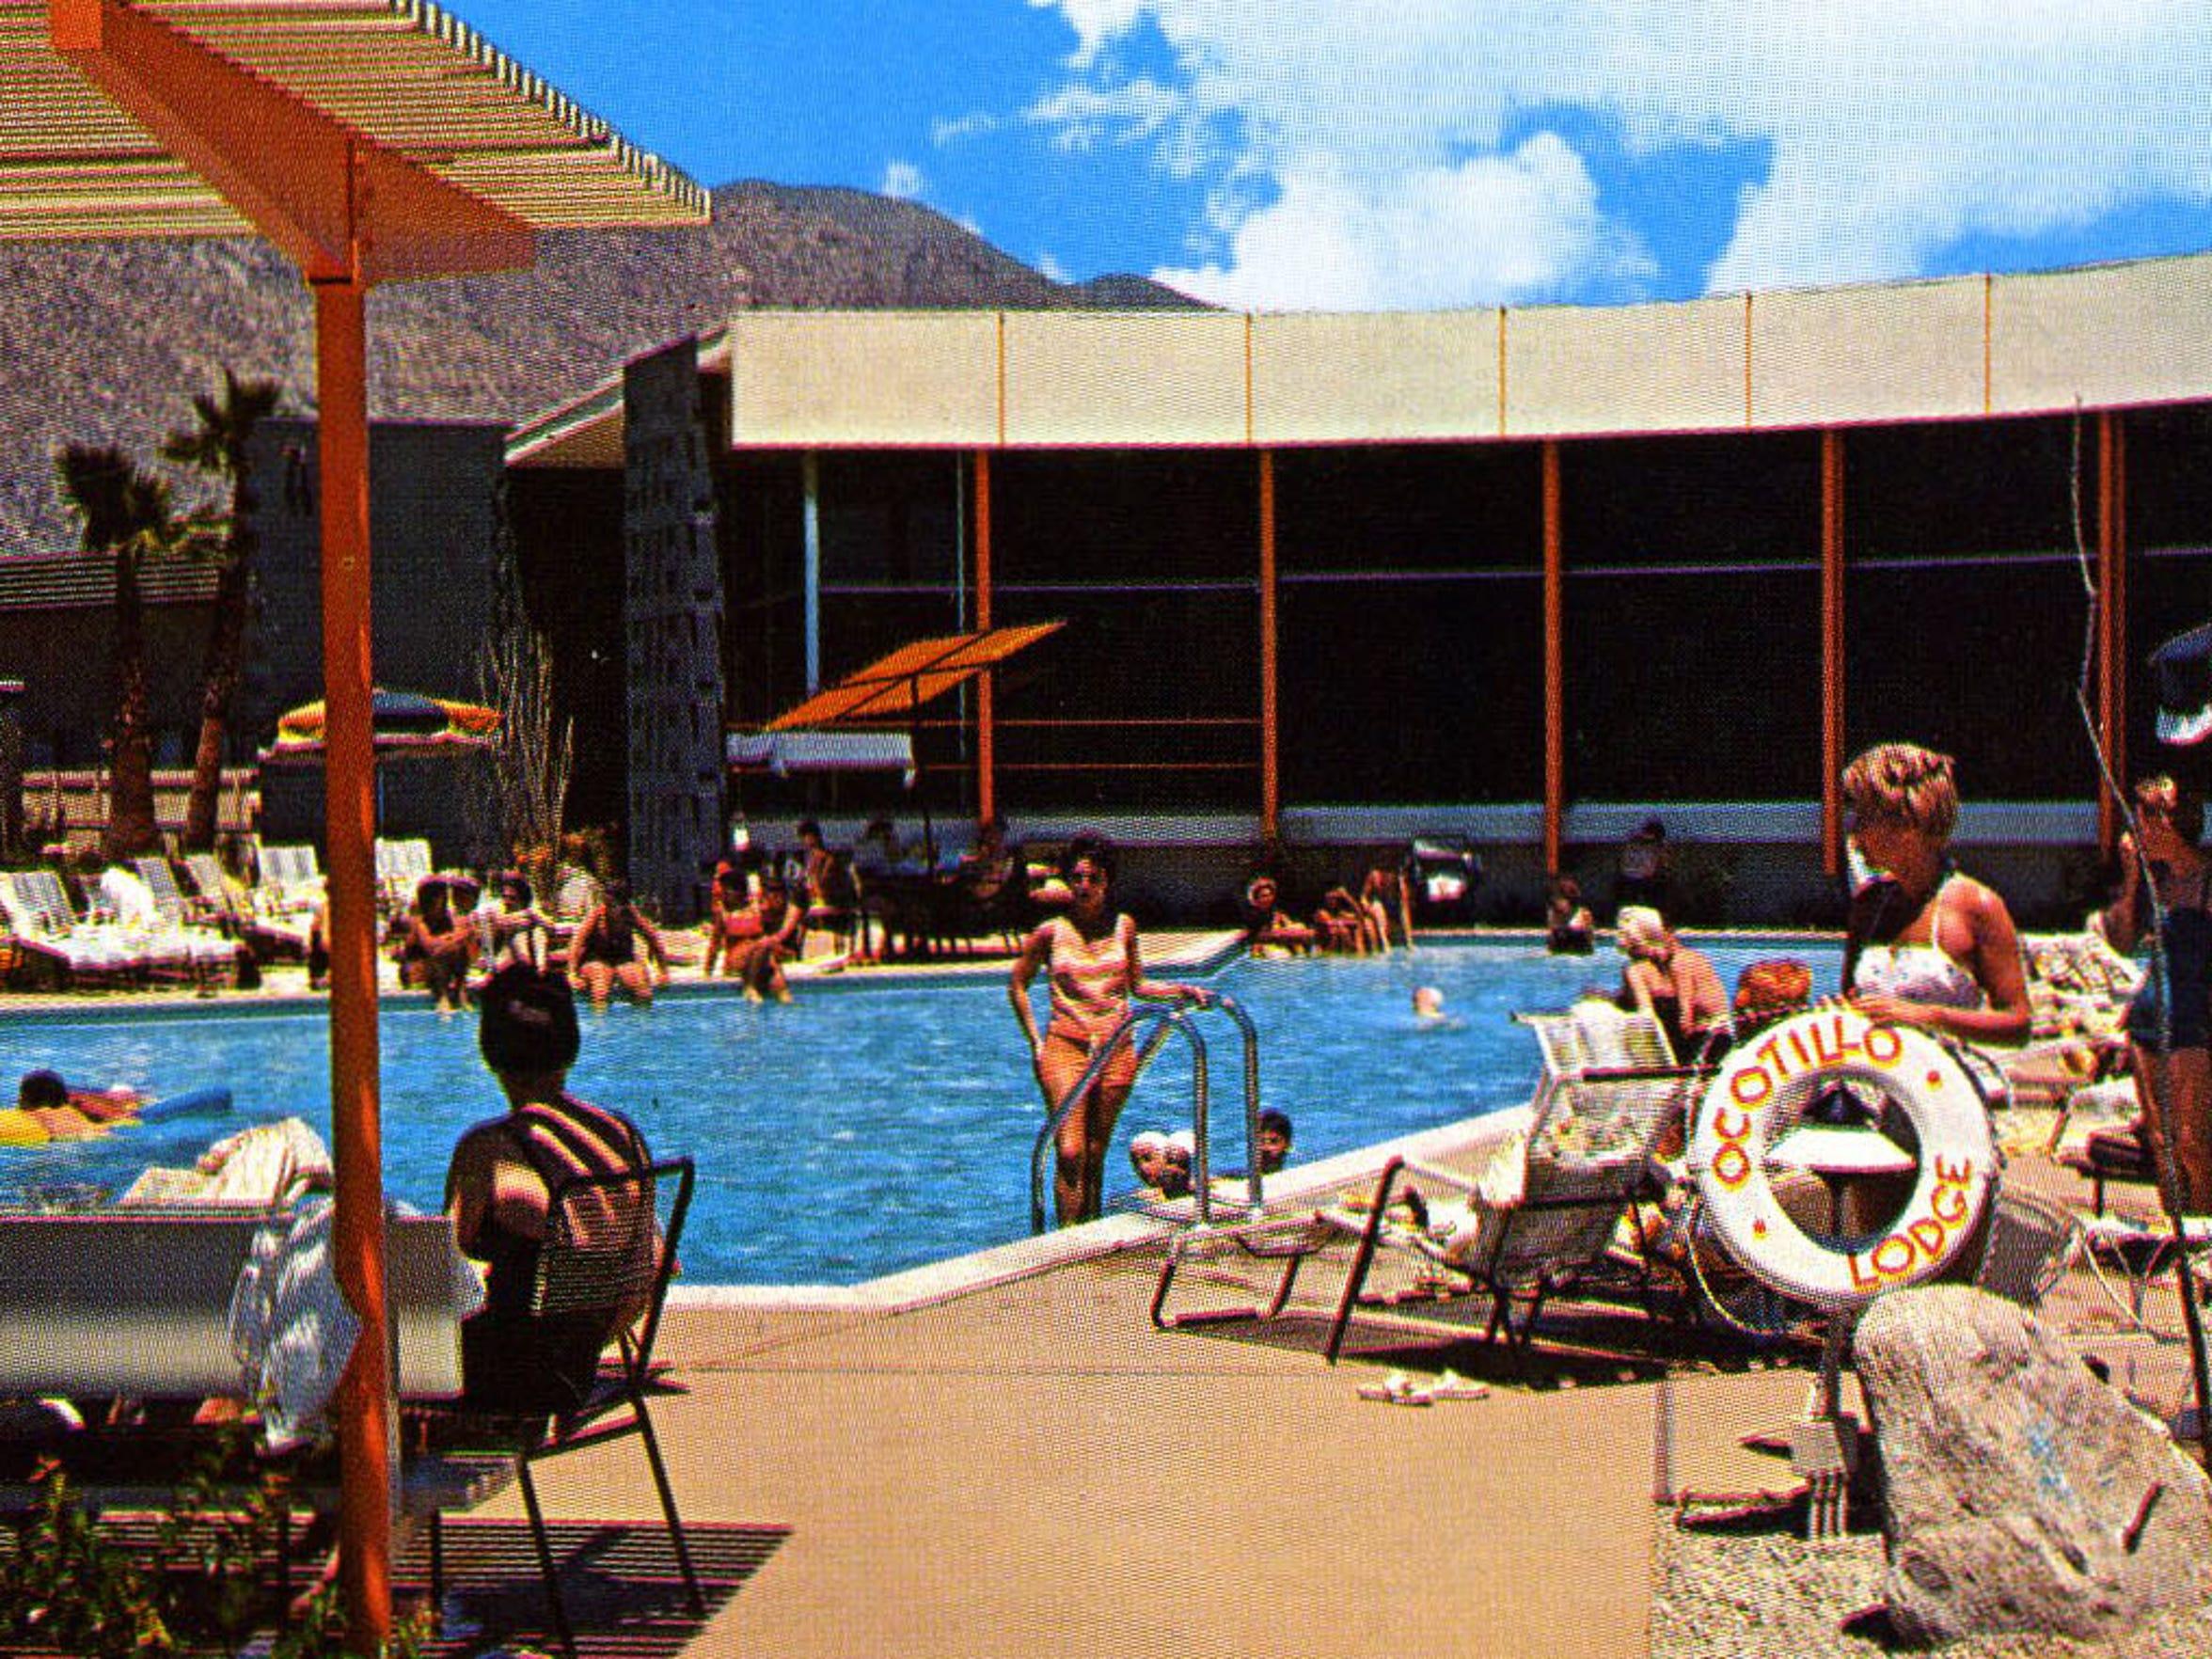 Ocotillo Lodge's pool area, circa 1960.